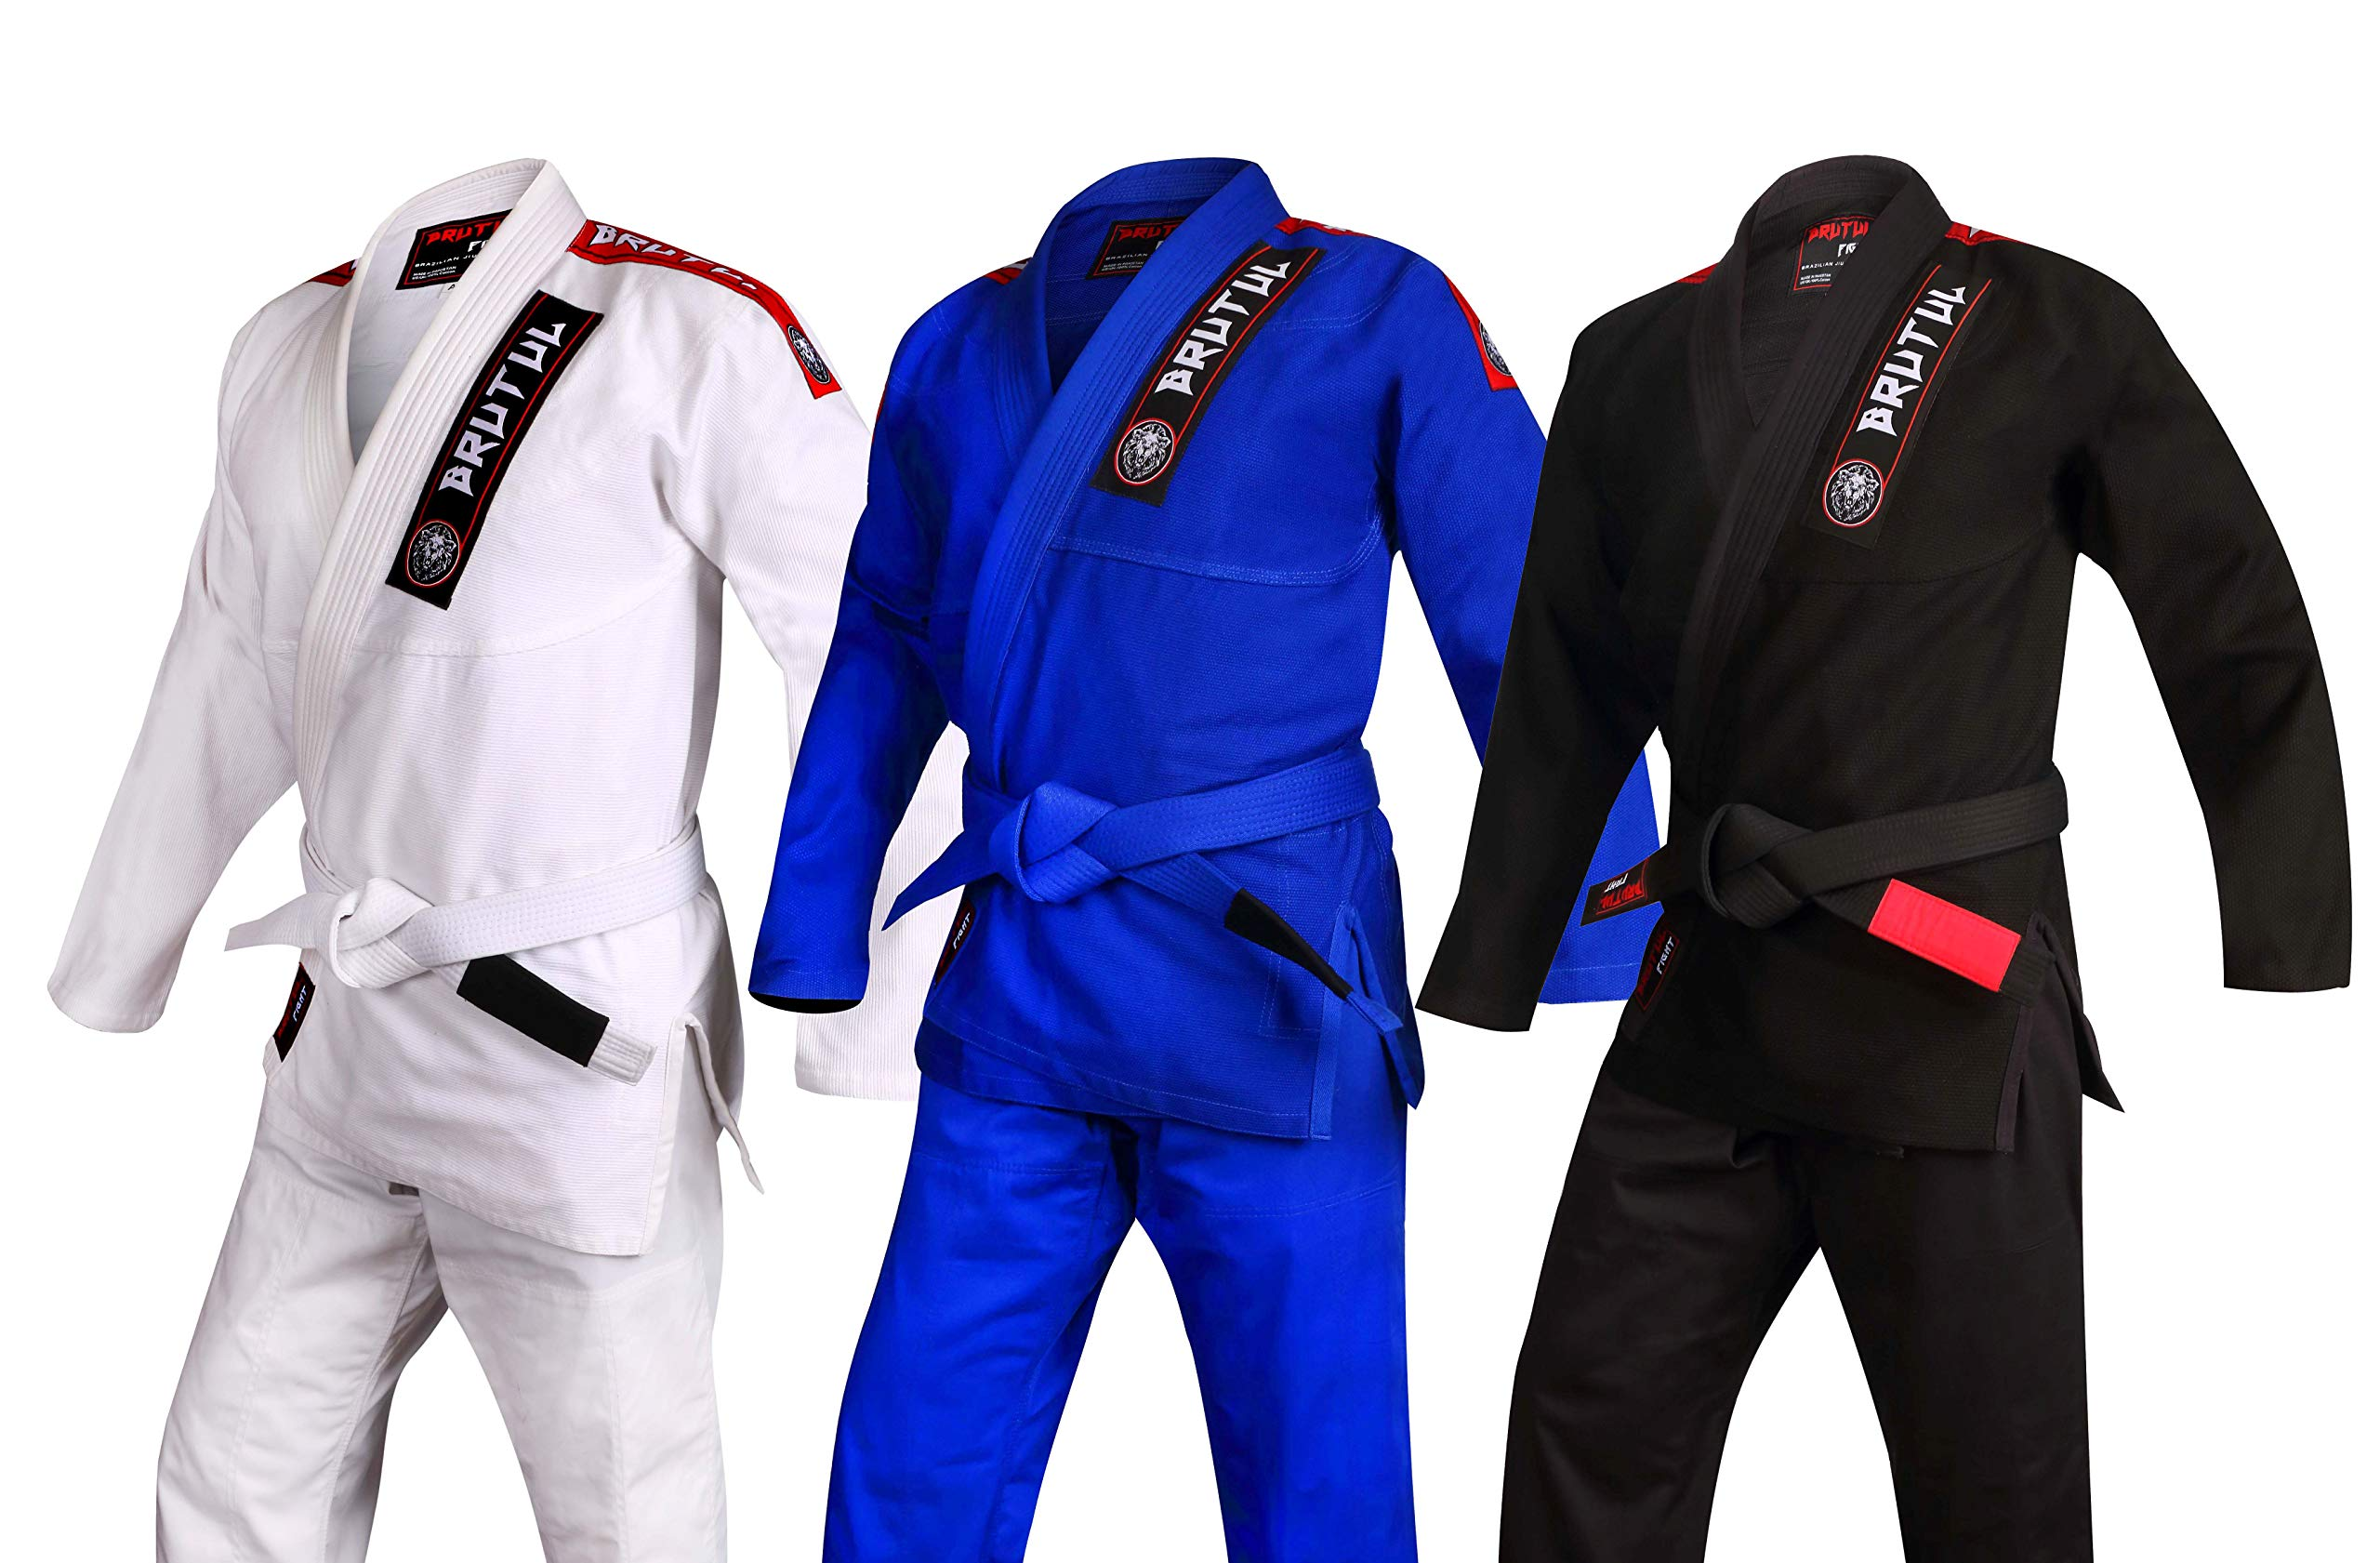 BRUTUL FIGHT Ultra Light BJJ Brazilian Jiu Jitsu Gi BJJ Gi Kimonos Lightweight for Kids with Preshrunk Fabric (Black, C3) by BRUTUL FIGHT